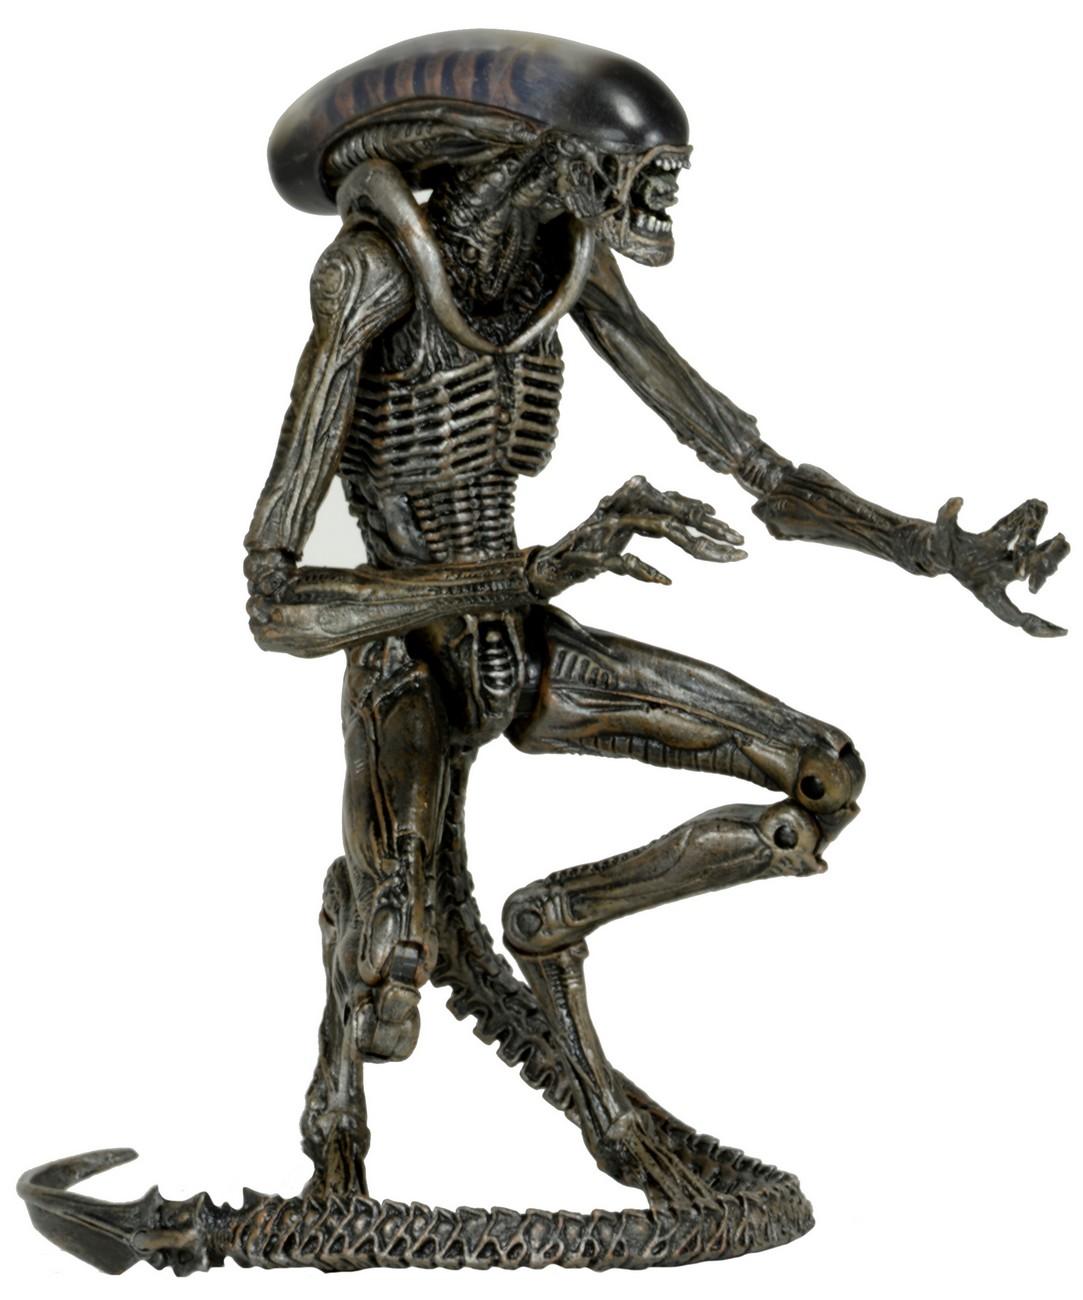 Grid Drawing Online Aliens 7 Quot Scale Action Figures Series 8 Necaonline Com